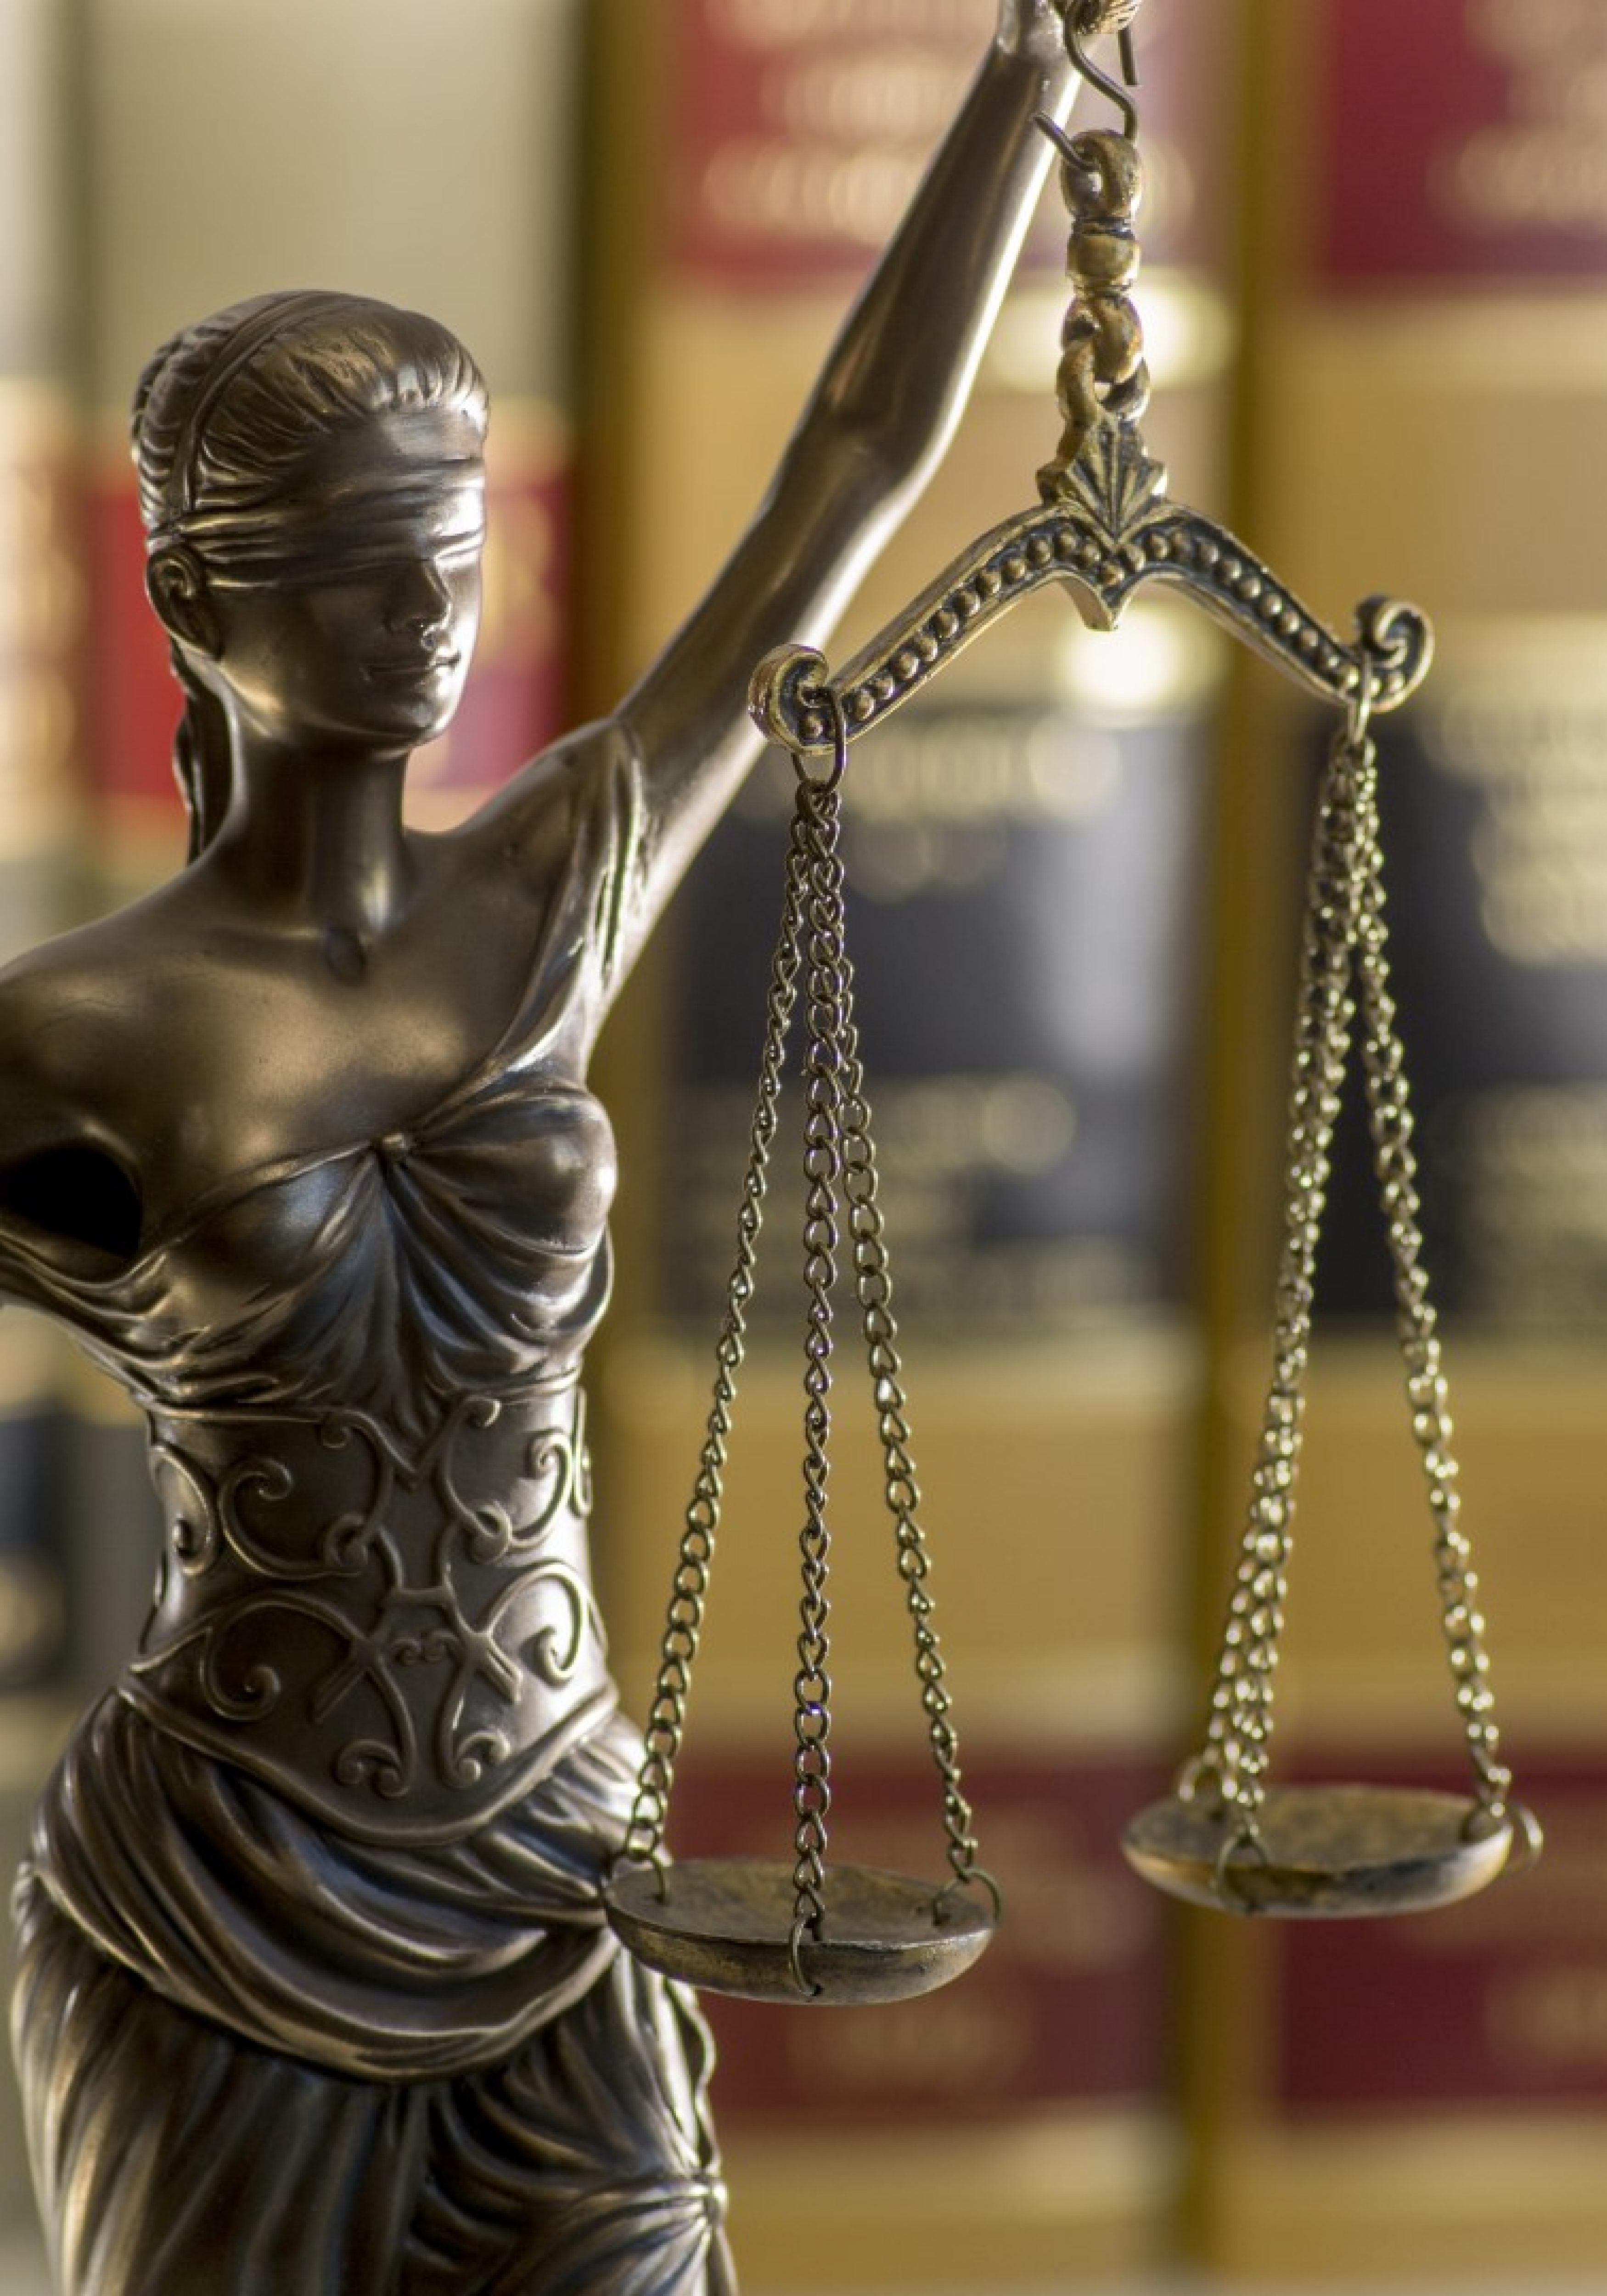 justice-3-Large-3500x5000.jpg